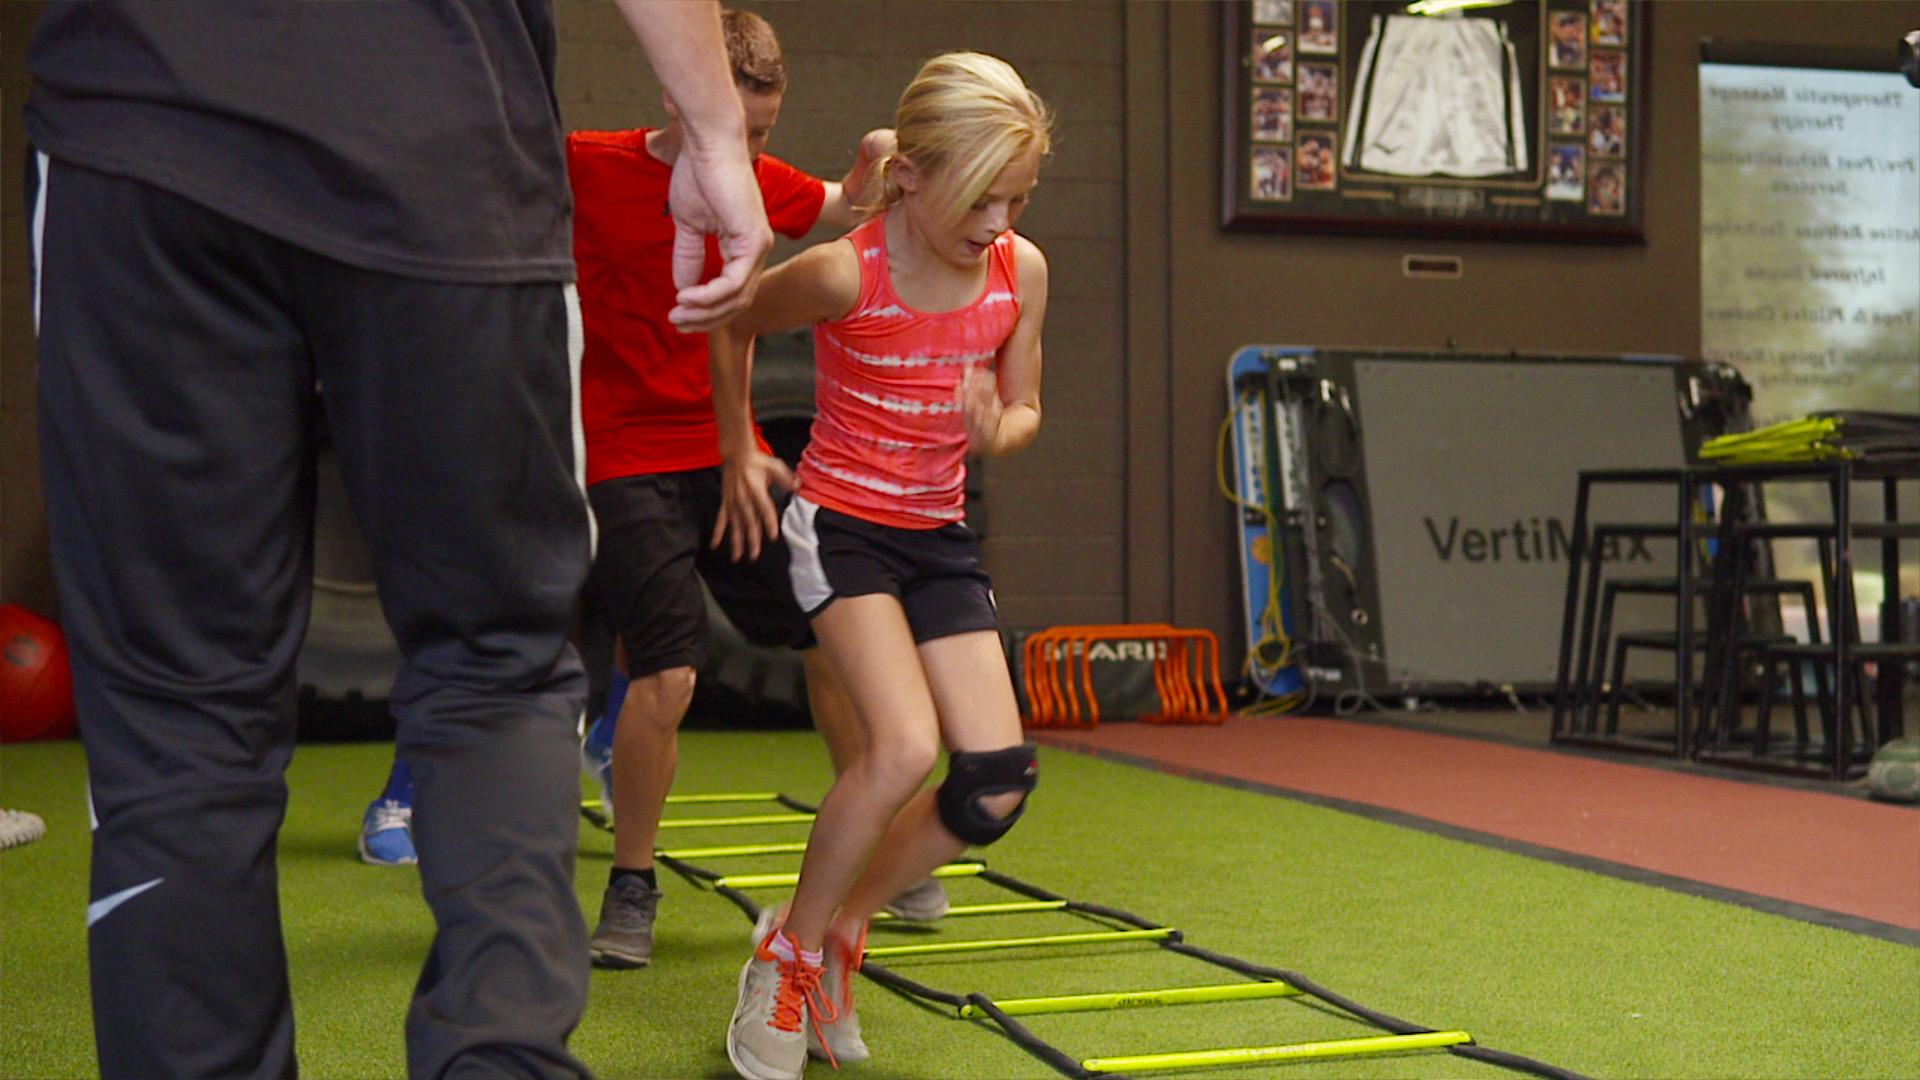 Athletic Training Center | Kinetix Health & Performance Center